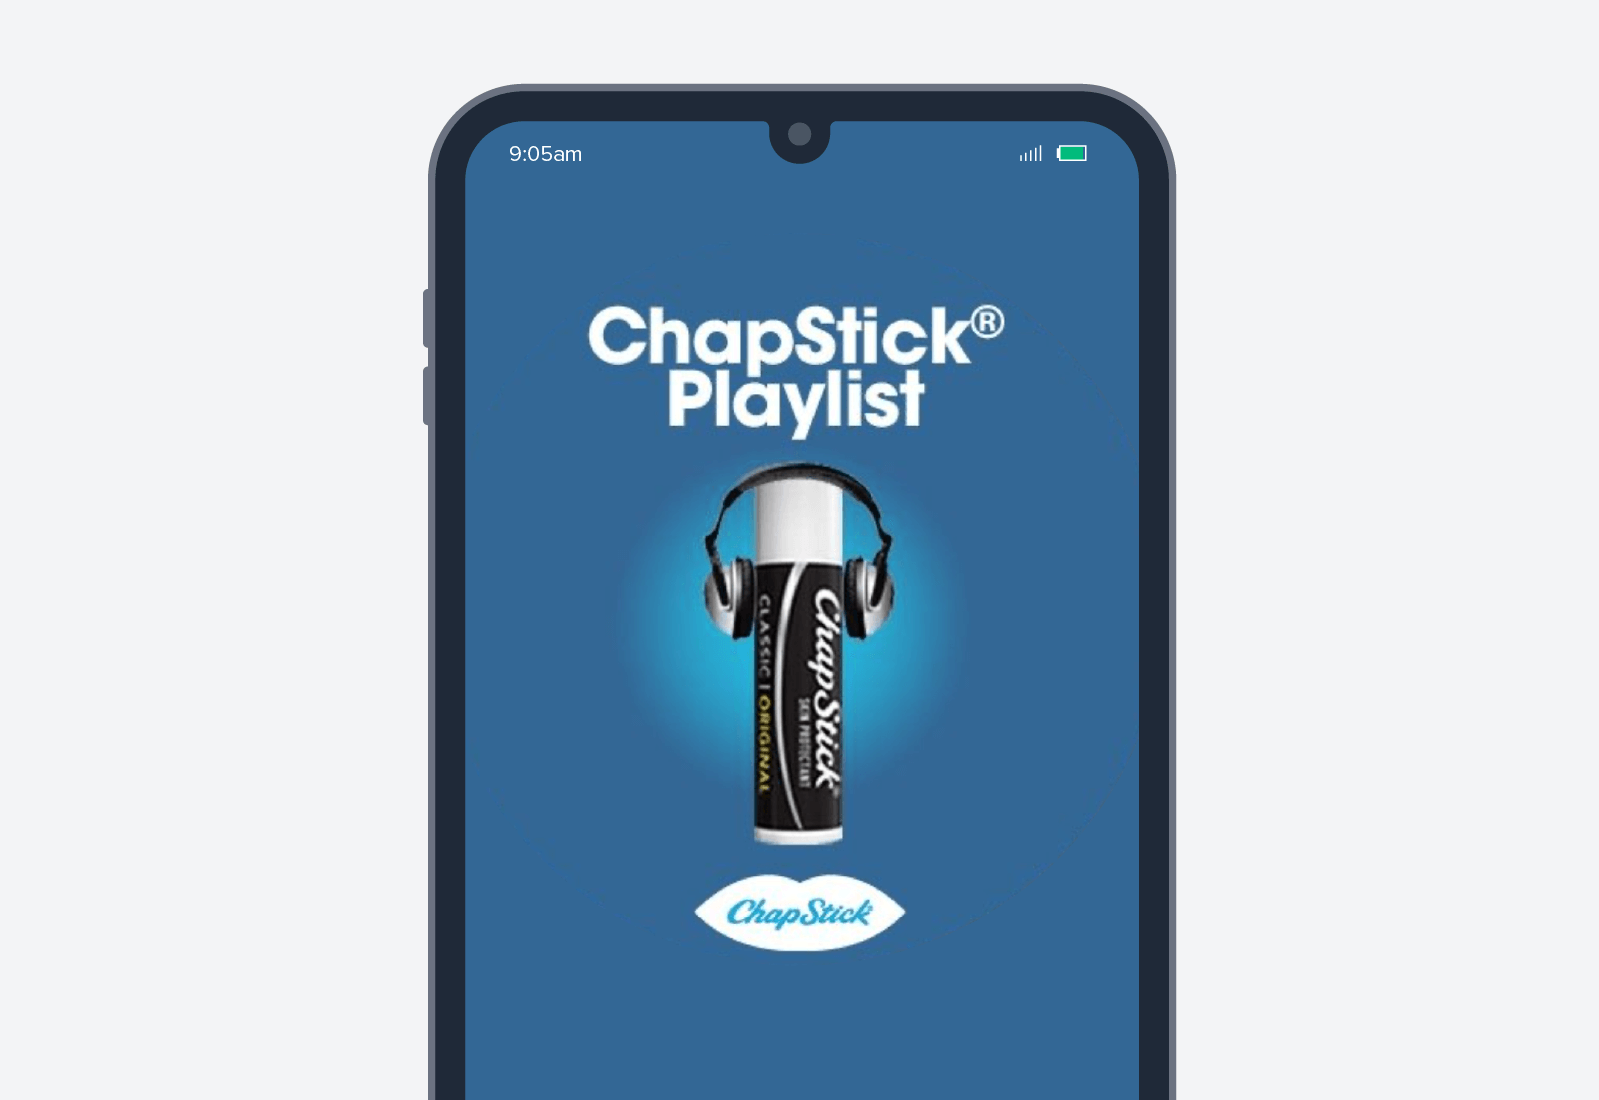 chapstick mobile advertisement